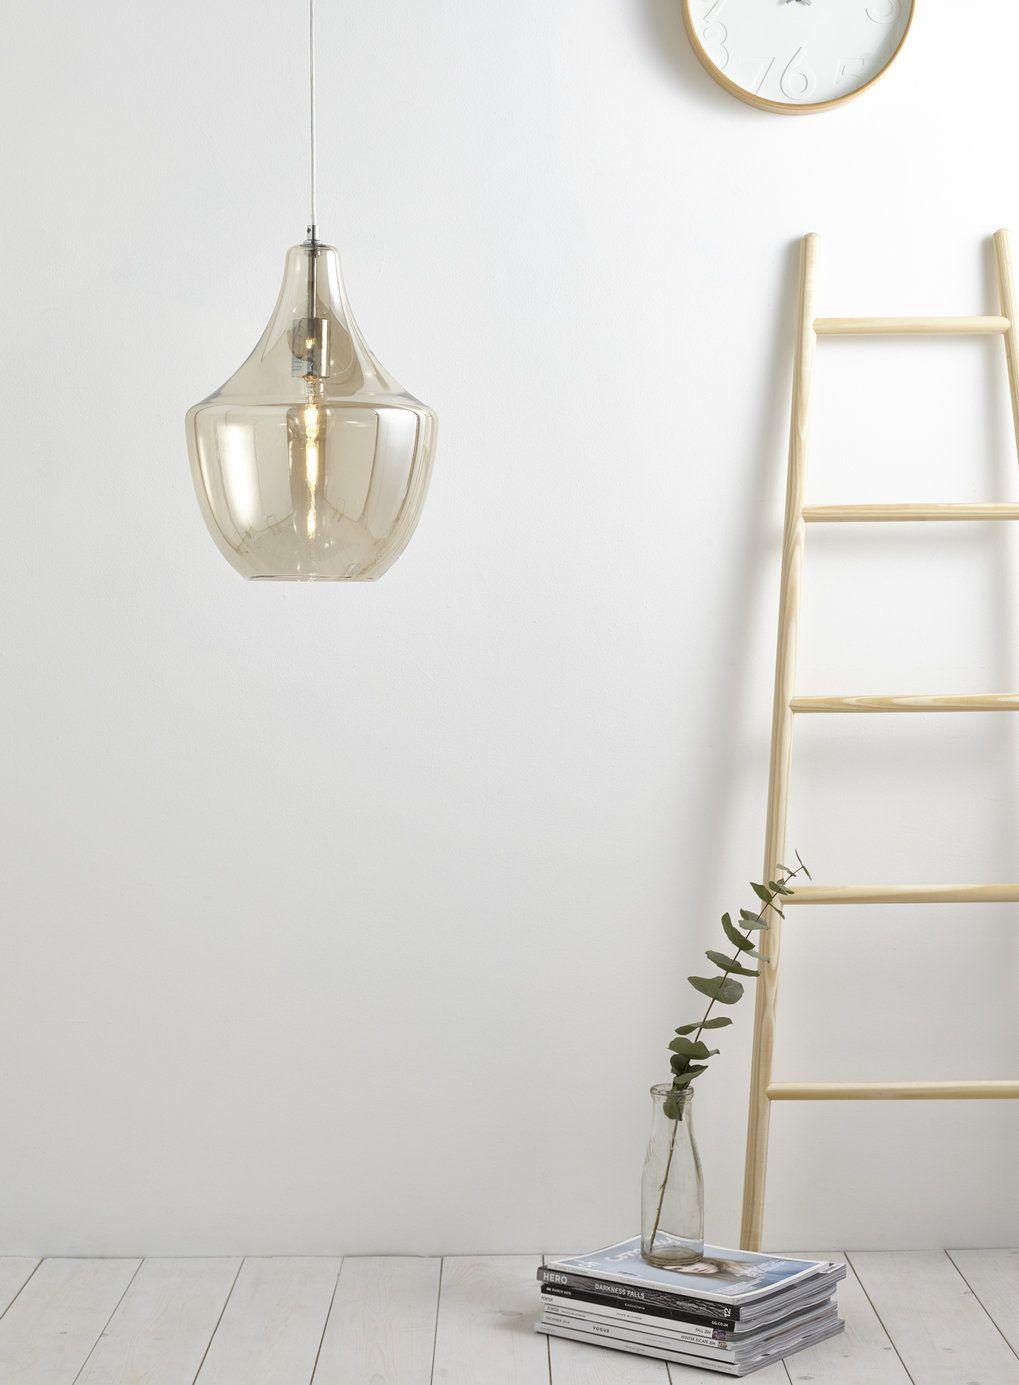 Cara pendant light pendants ceiling lights home lighting cara pendant light pendants ceiling lights home lighting furniture bhs mozeypictures Choice Image